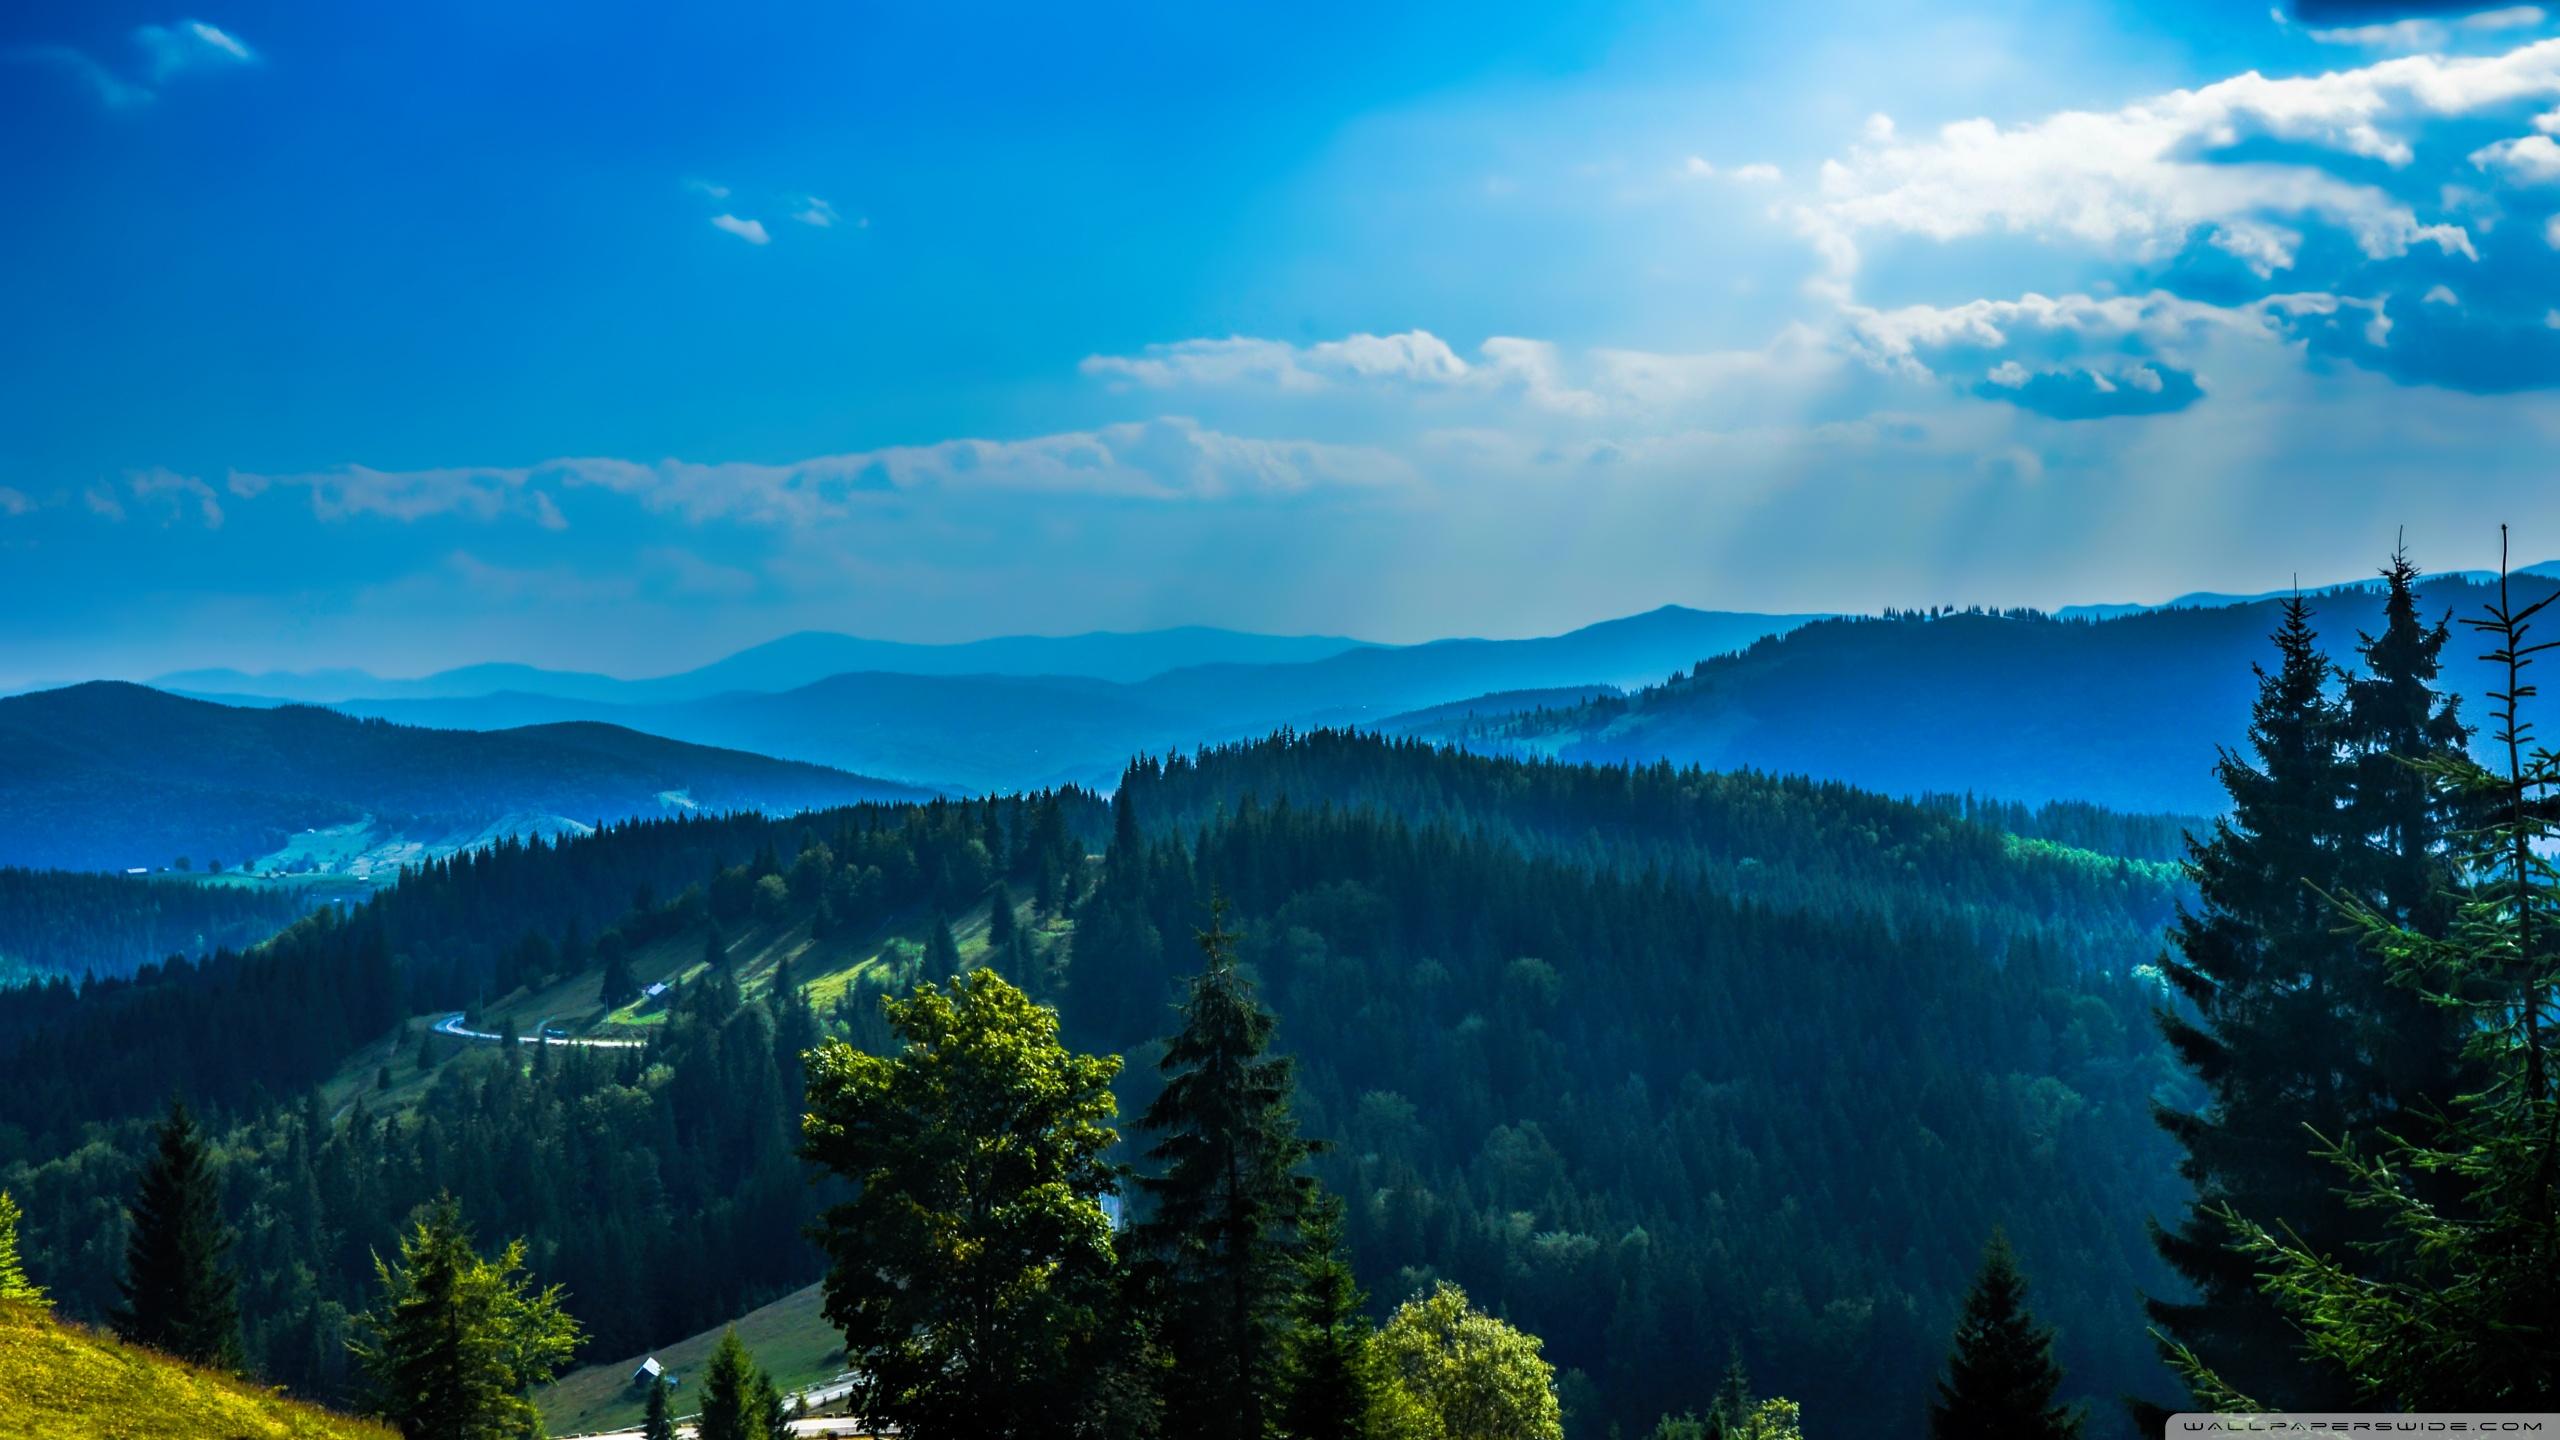 landscape_51-wallpaper-2560x1440